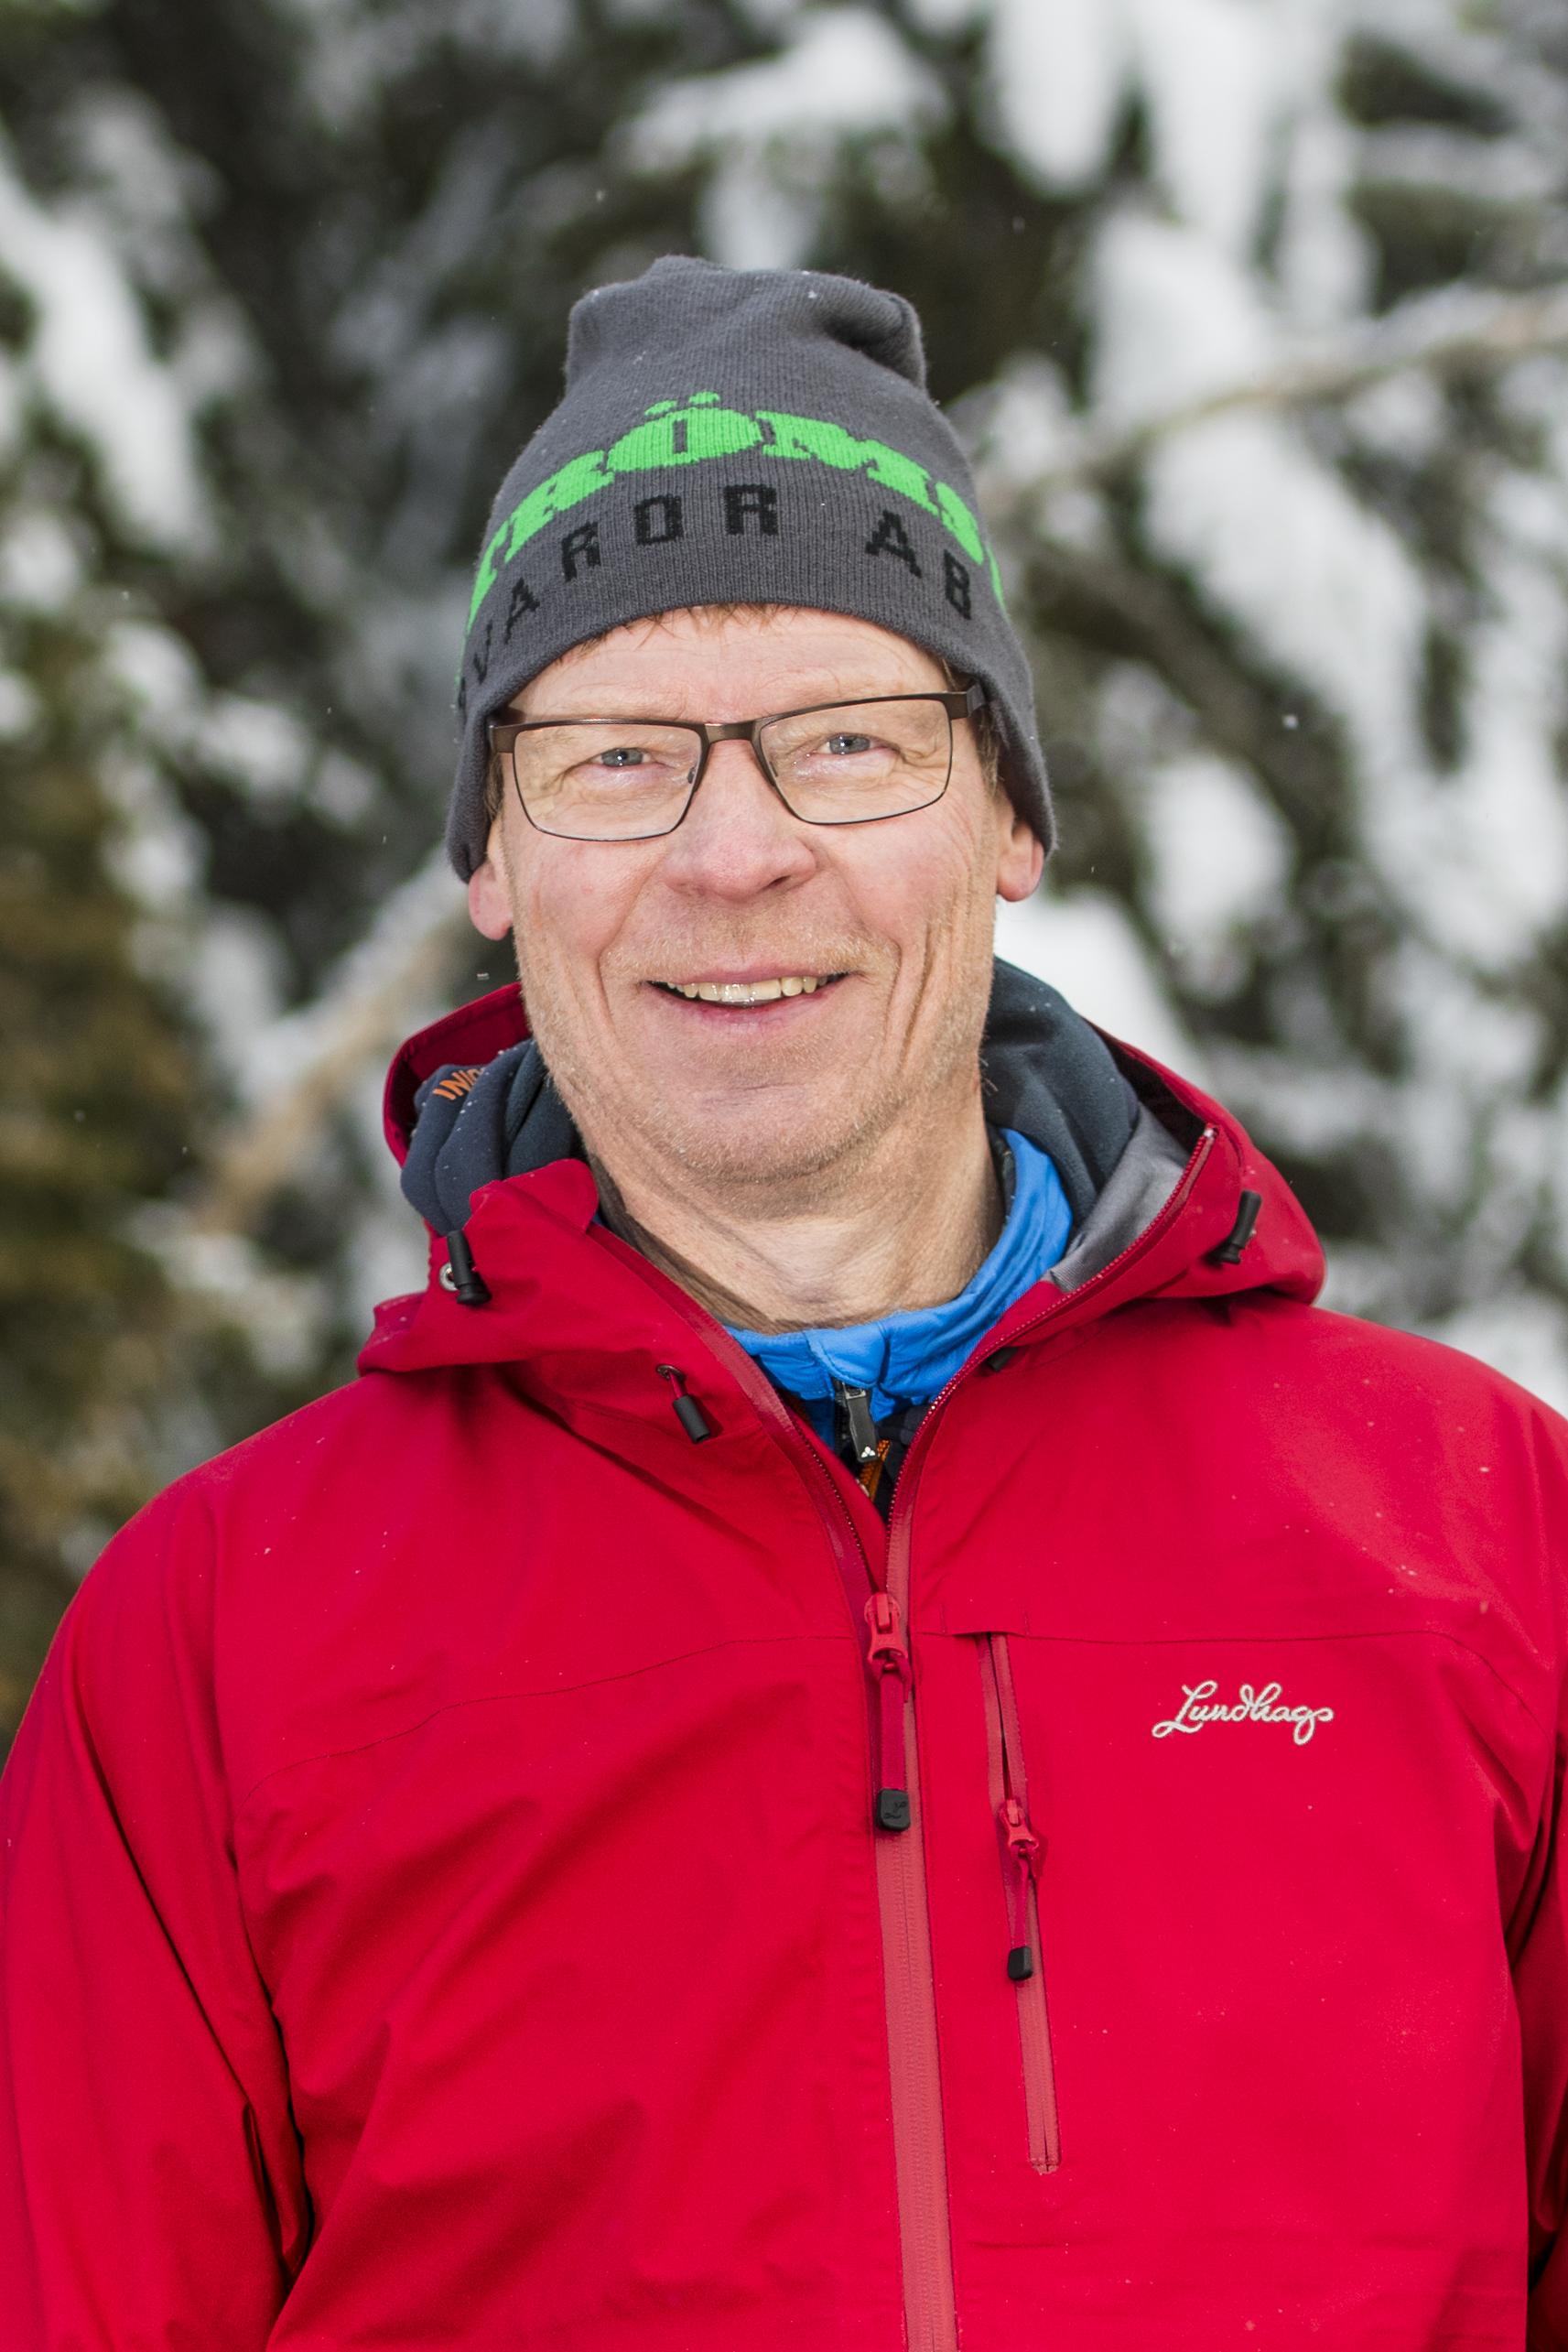 Rolf Sandberg